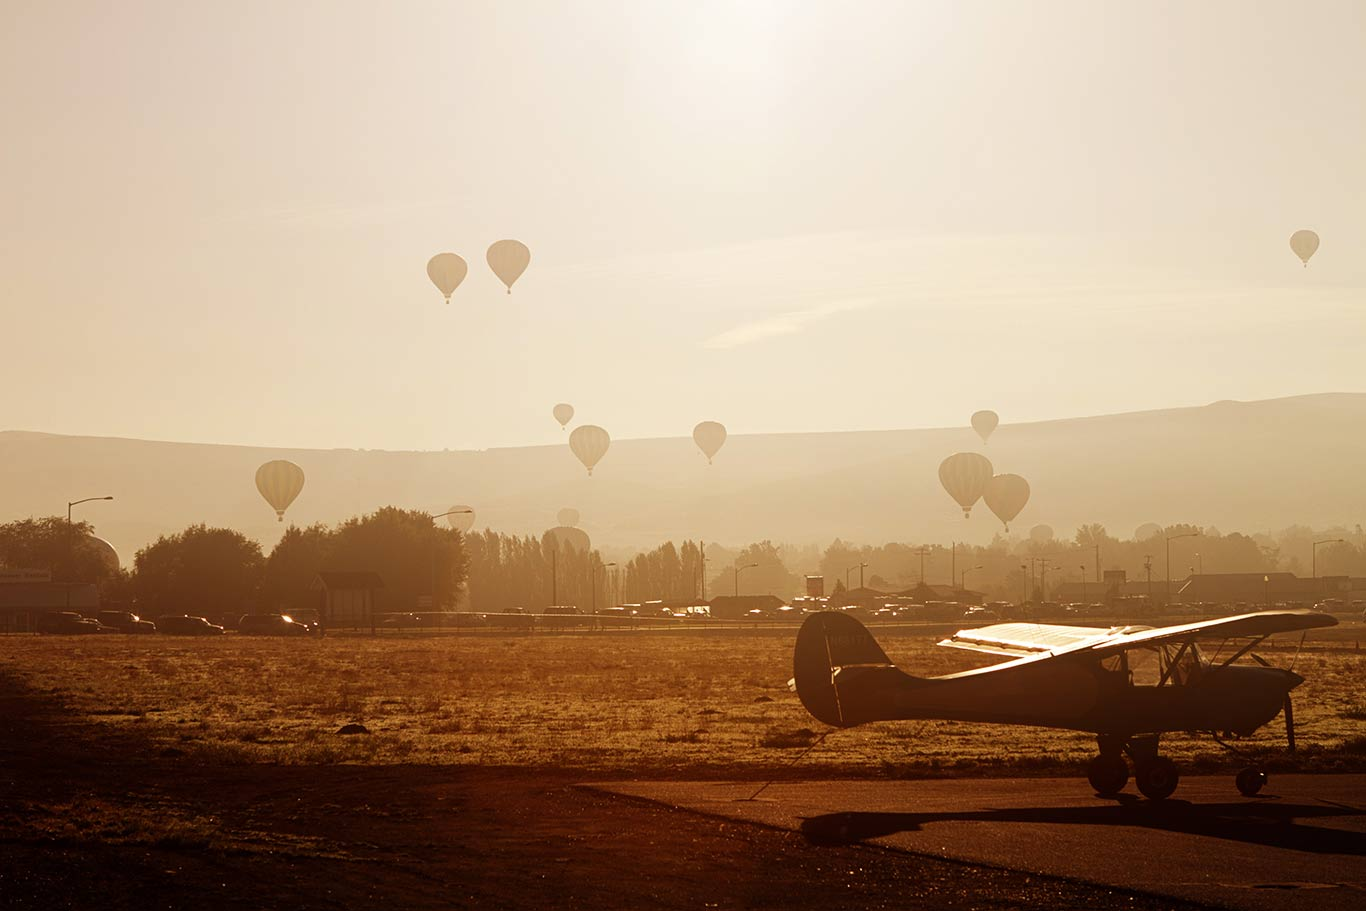 Airplane and hot air baloons